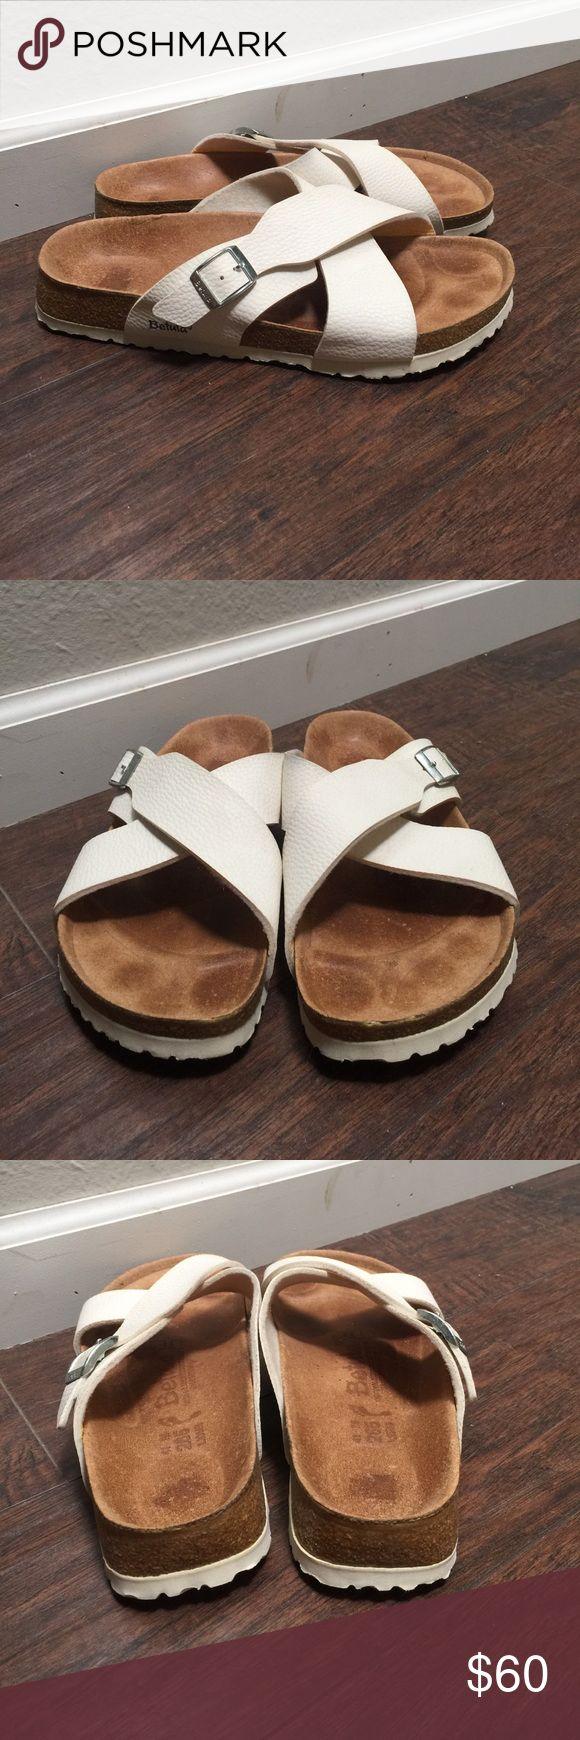 Birkenstock Betula Sandals Birkenstock Betula cross cross sandals size L10 Birkenstock Shoes Sandals